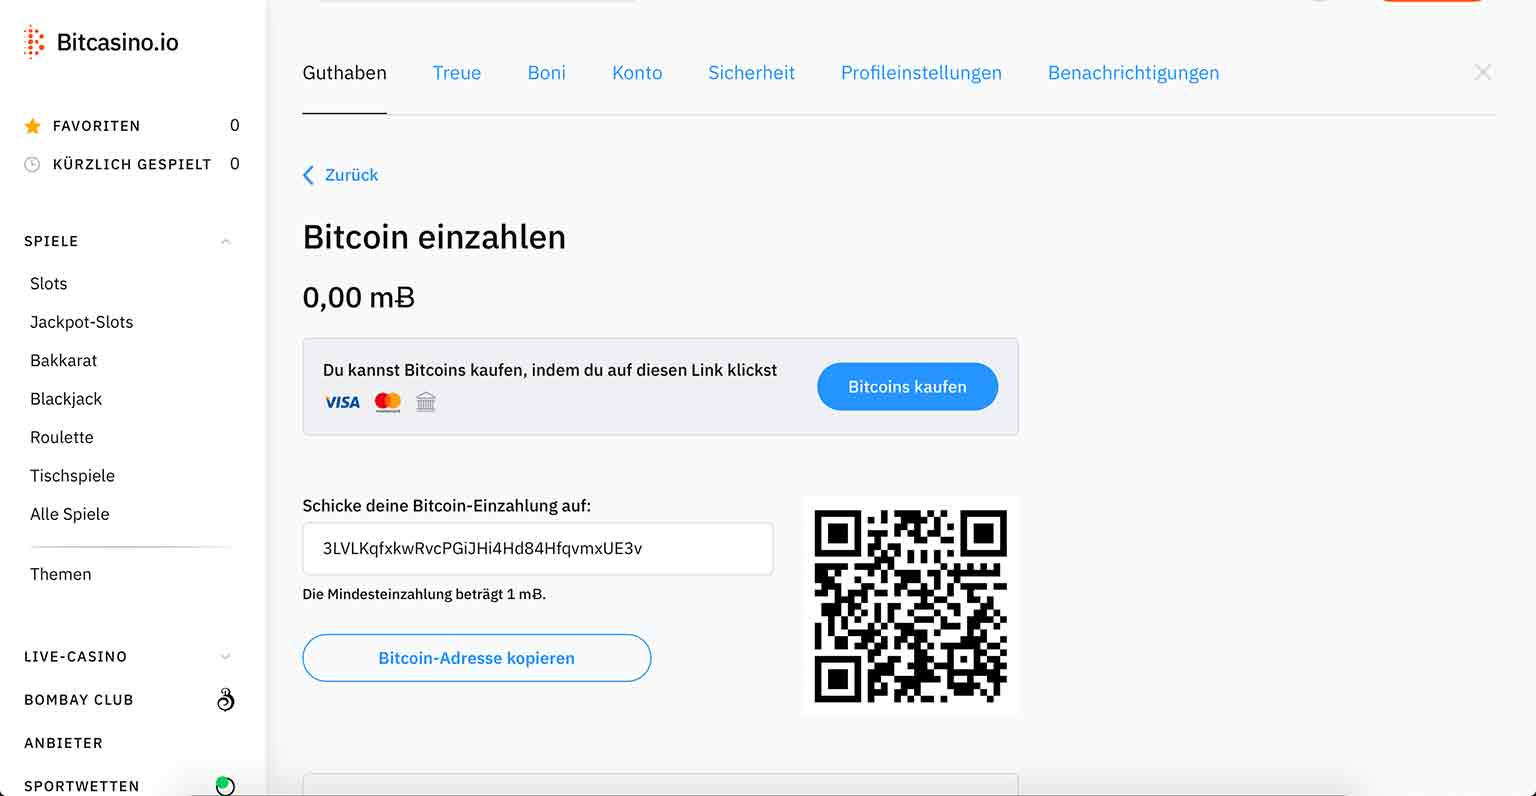 Bitcasino.io Zahlungsmethoden